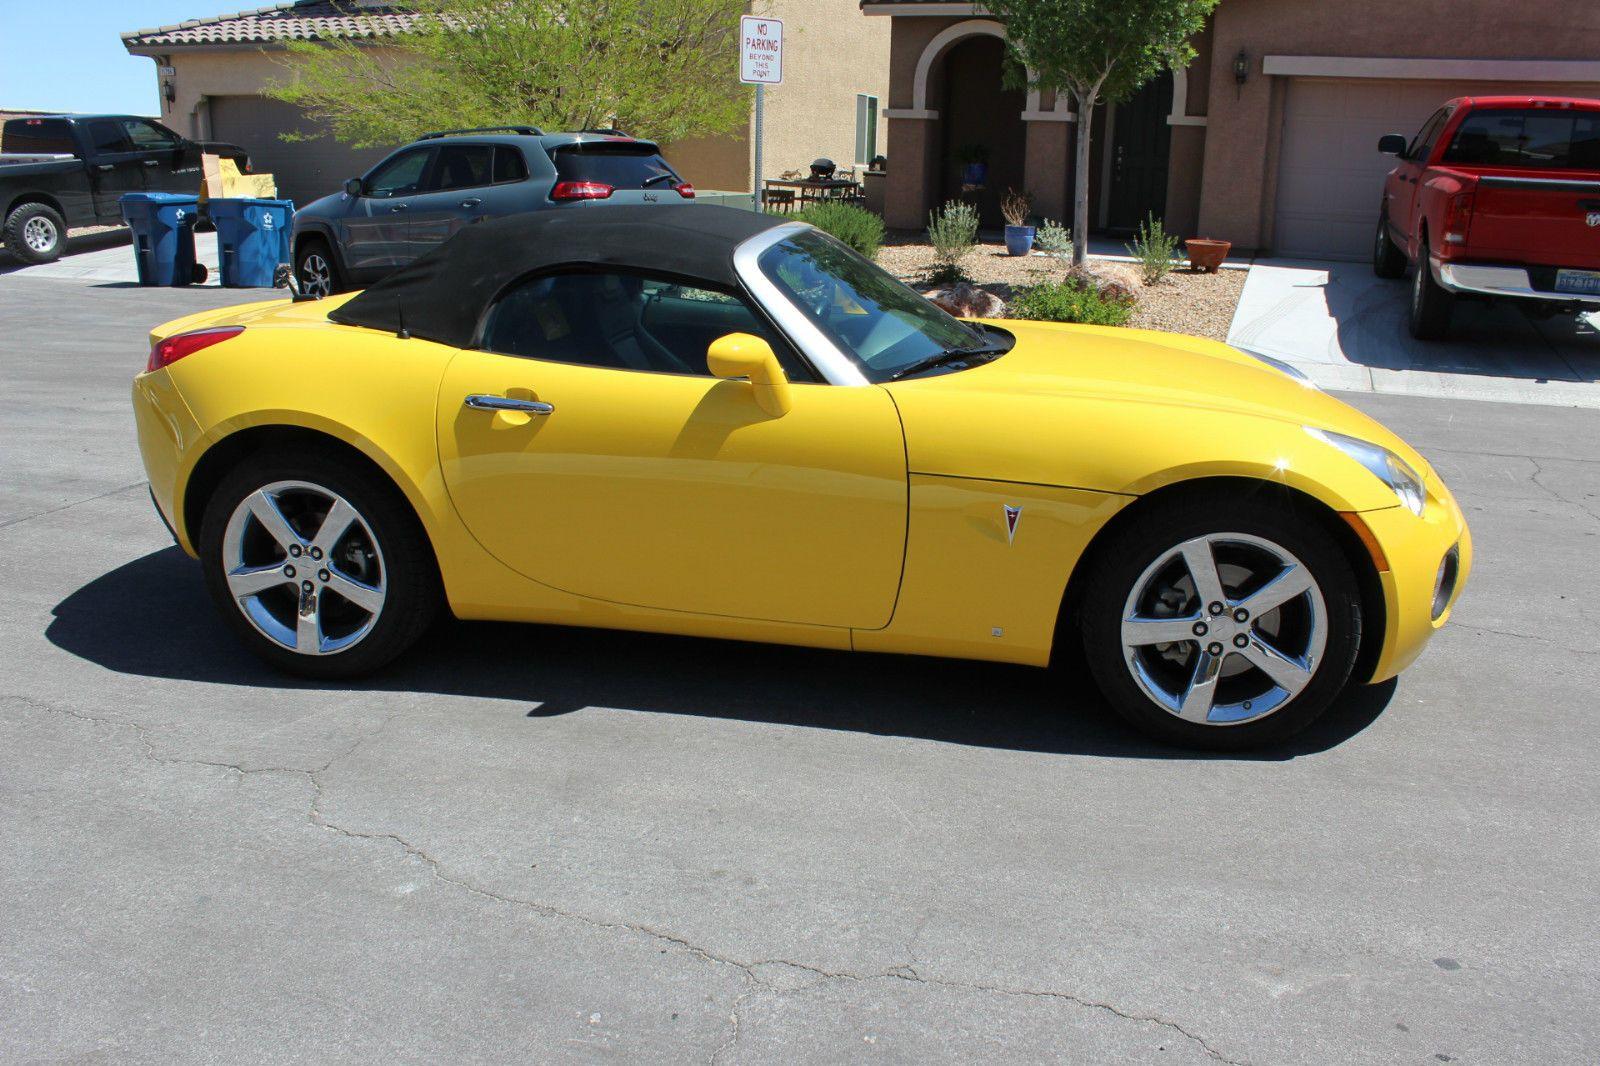 2008 pontiac solstice gxp turbo convertibles for sale pinterest rh pinterest com pontiac solstice manual 2006 pontiac solstice manual